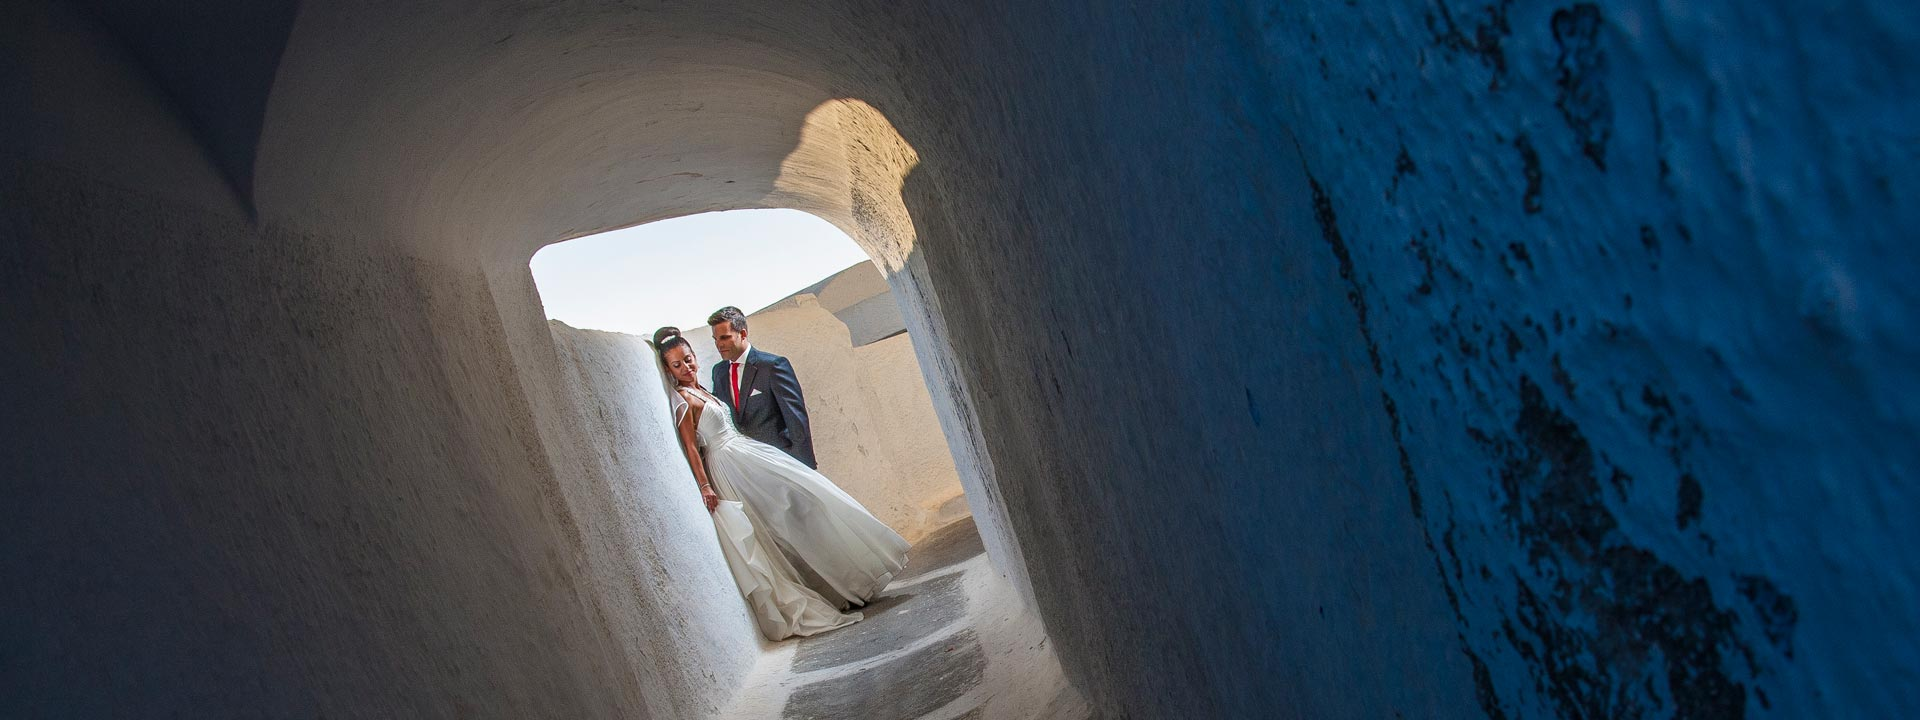 santorini-weddings-home-3